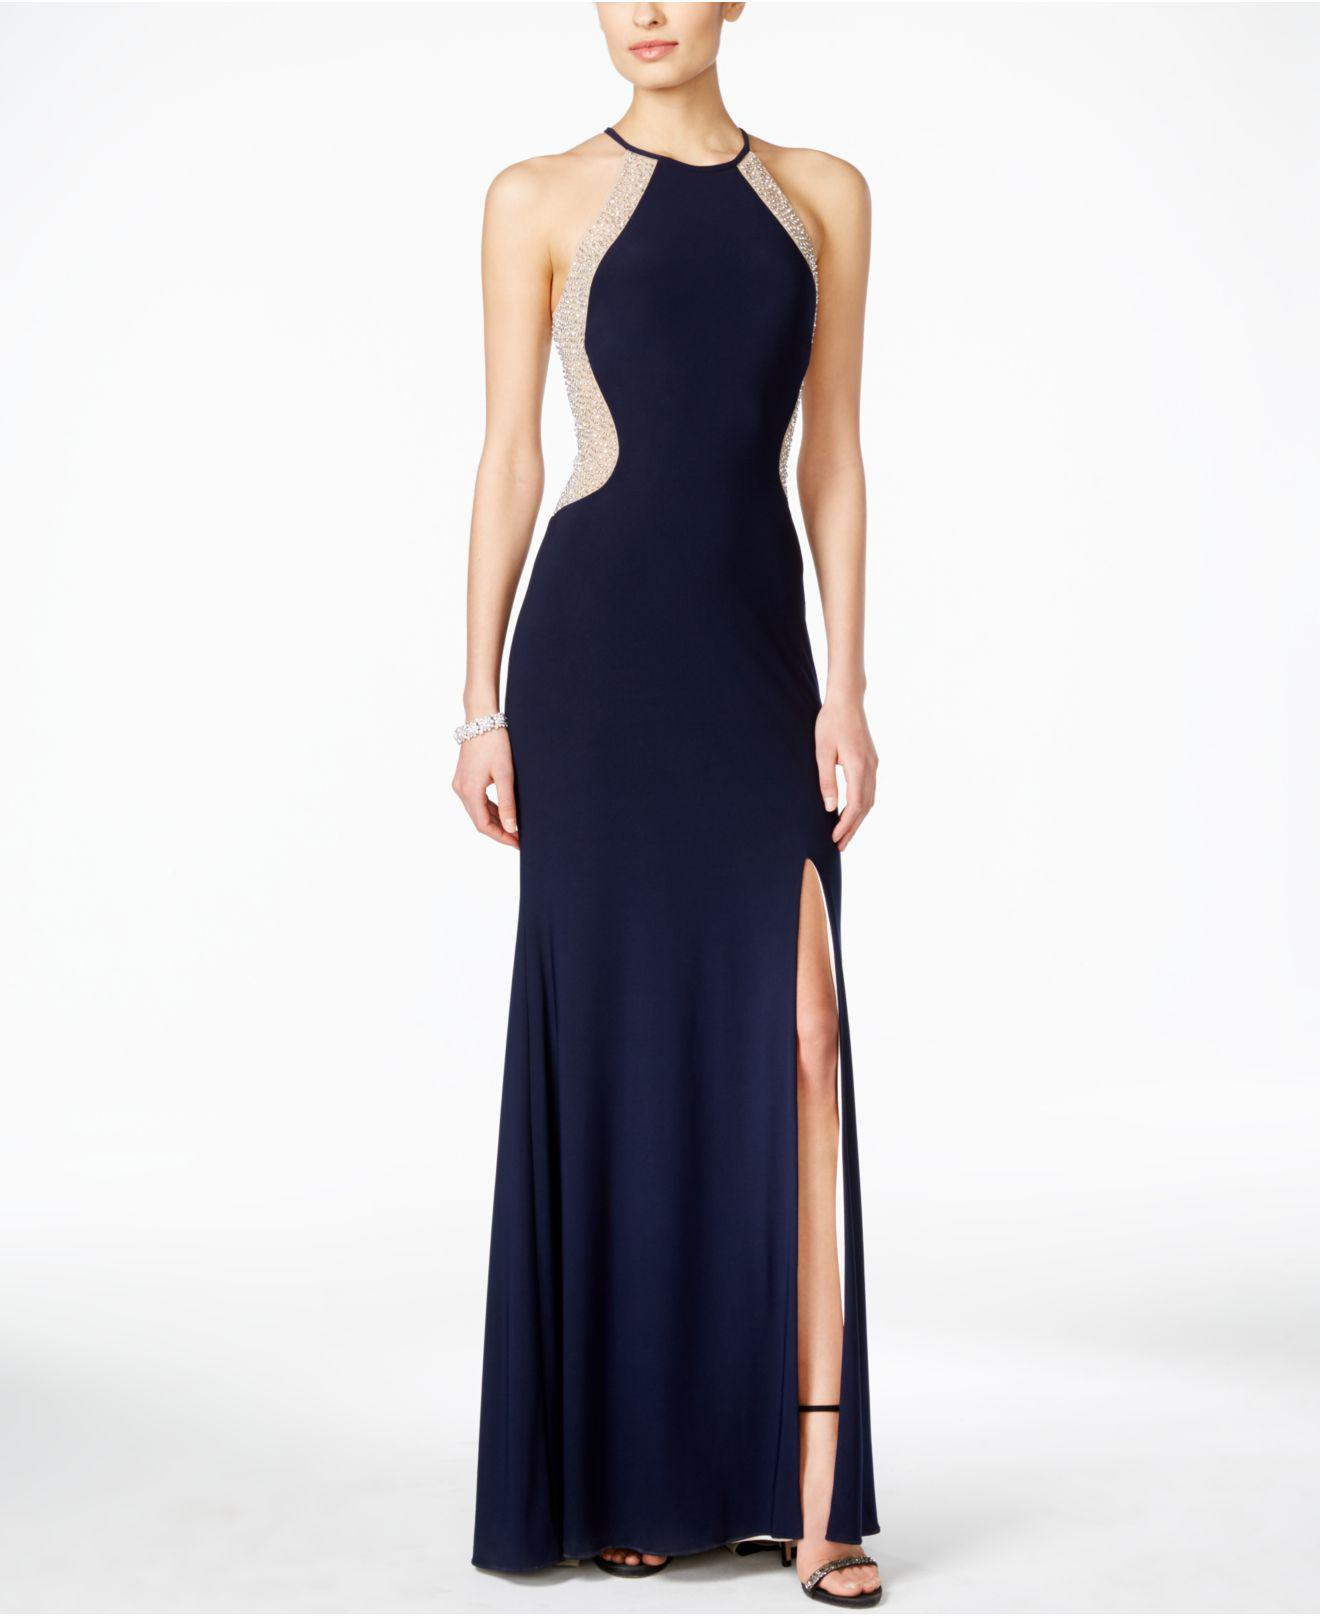 Lyst - Xscape Dazzling Illusion Halter Gown in Blue